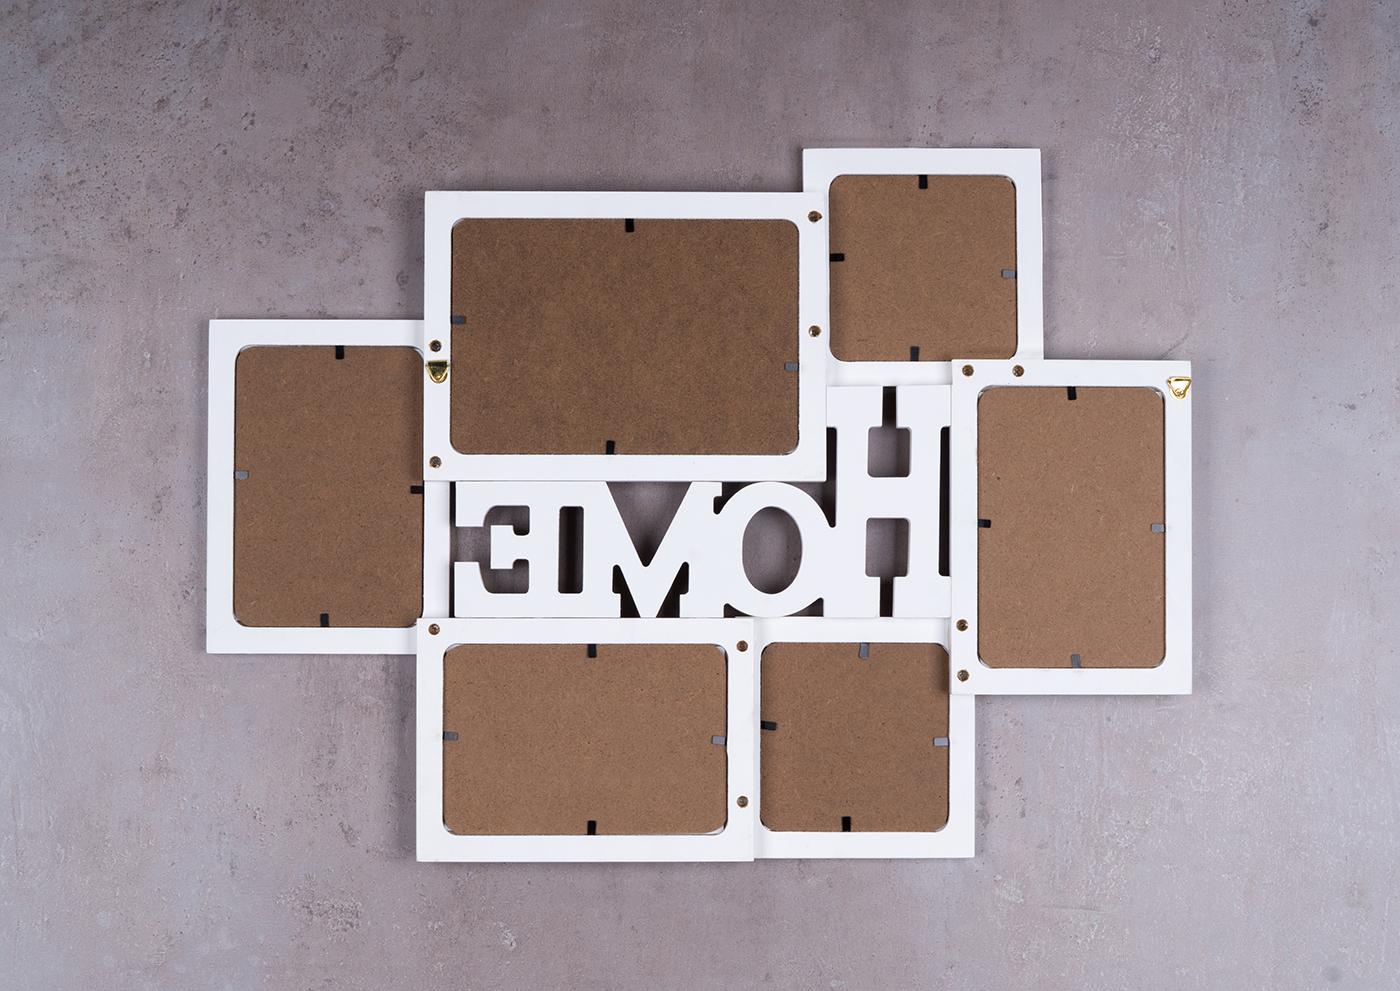 bilderrahmen holz 6 fotos home 53x38 5 fotorahmen collage galerie kaufen bei living by design. Black Bedroom Furniture Sets. Home Design Ideas